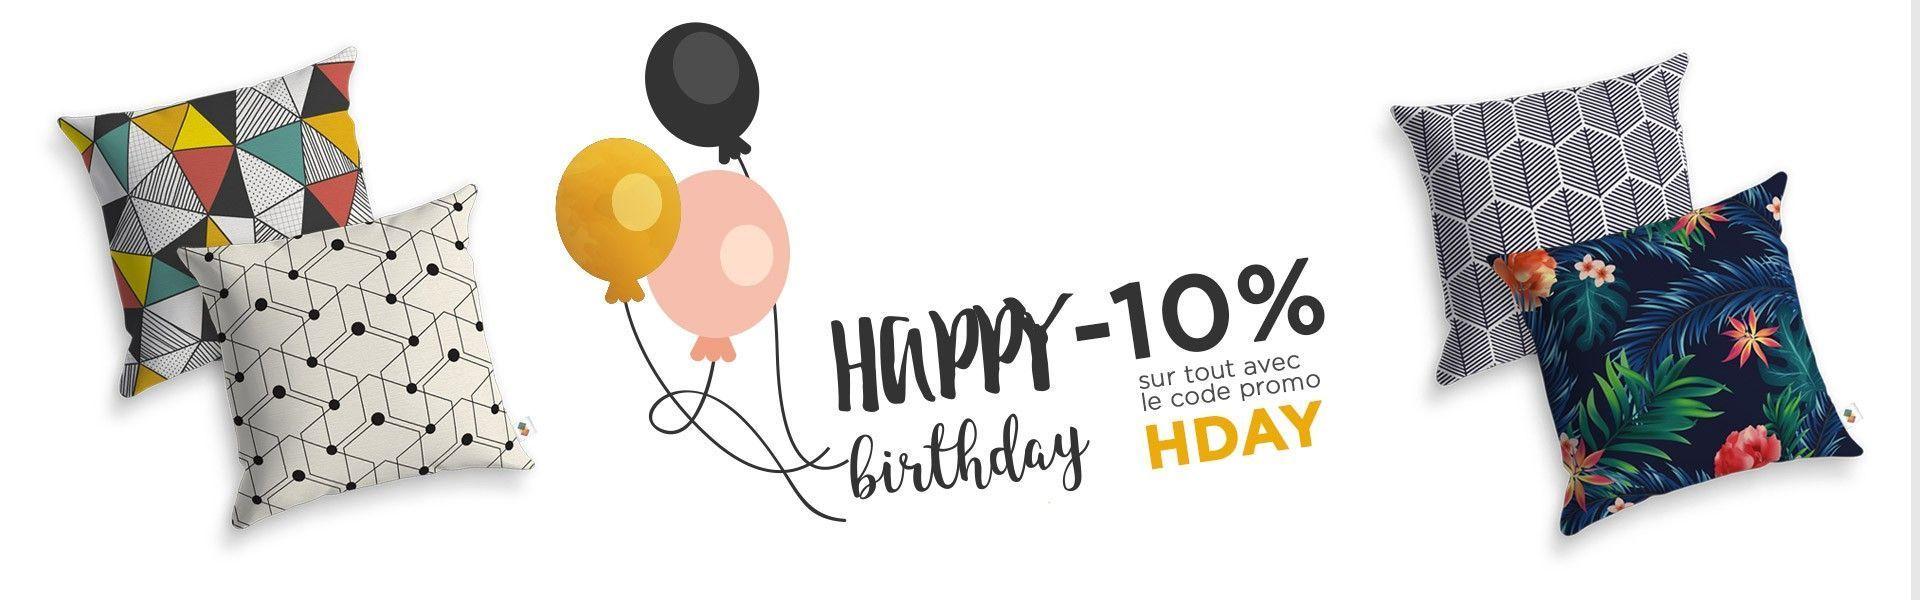 encart happy birthday HDC